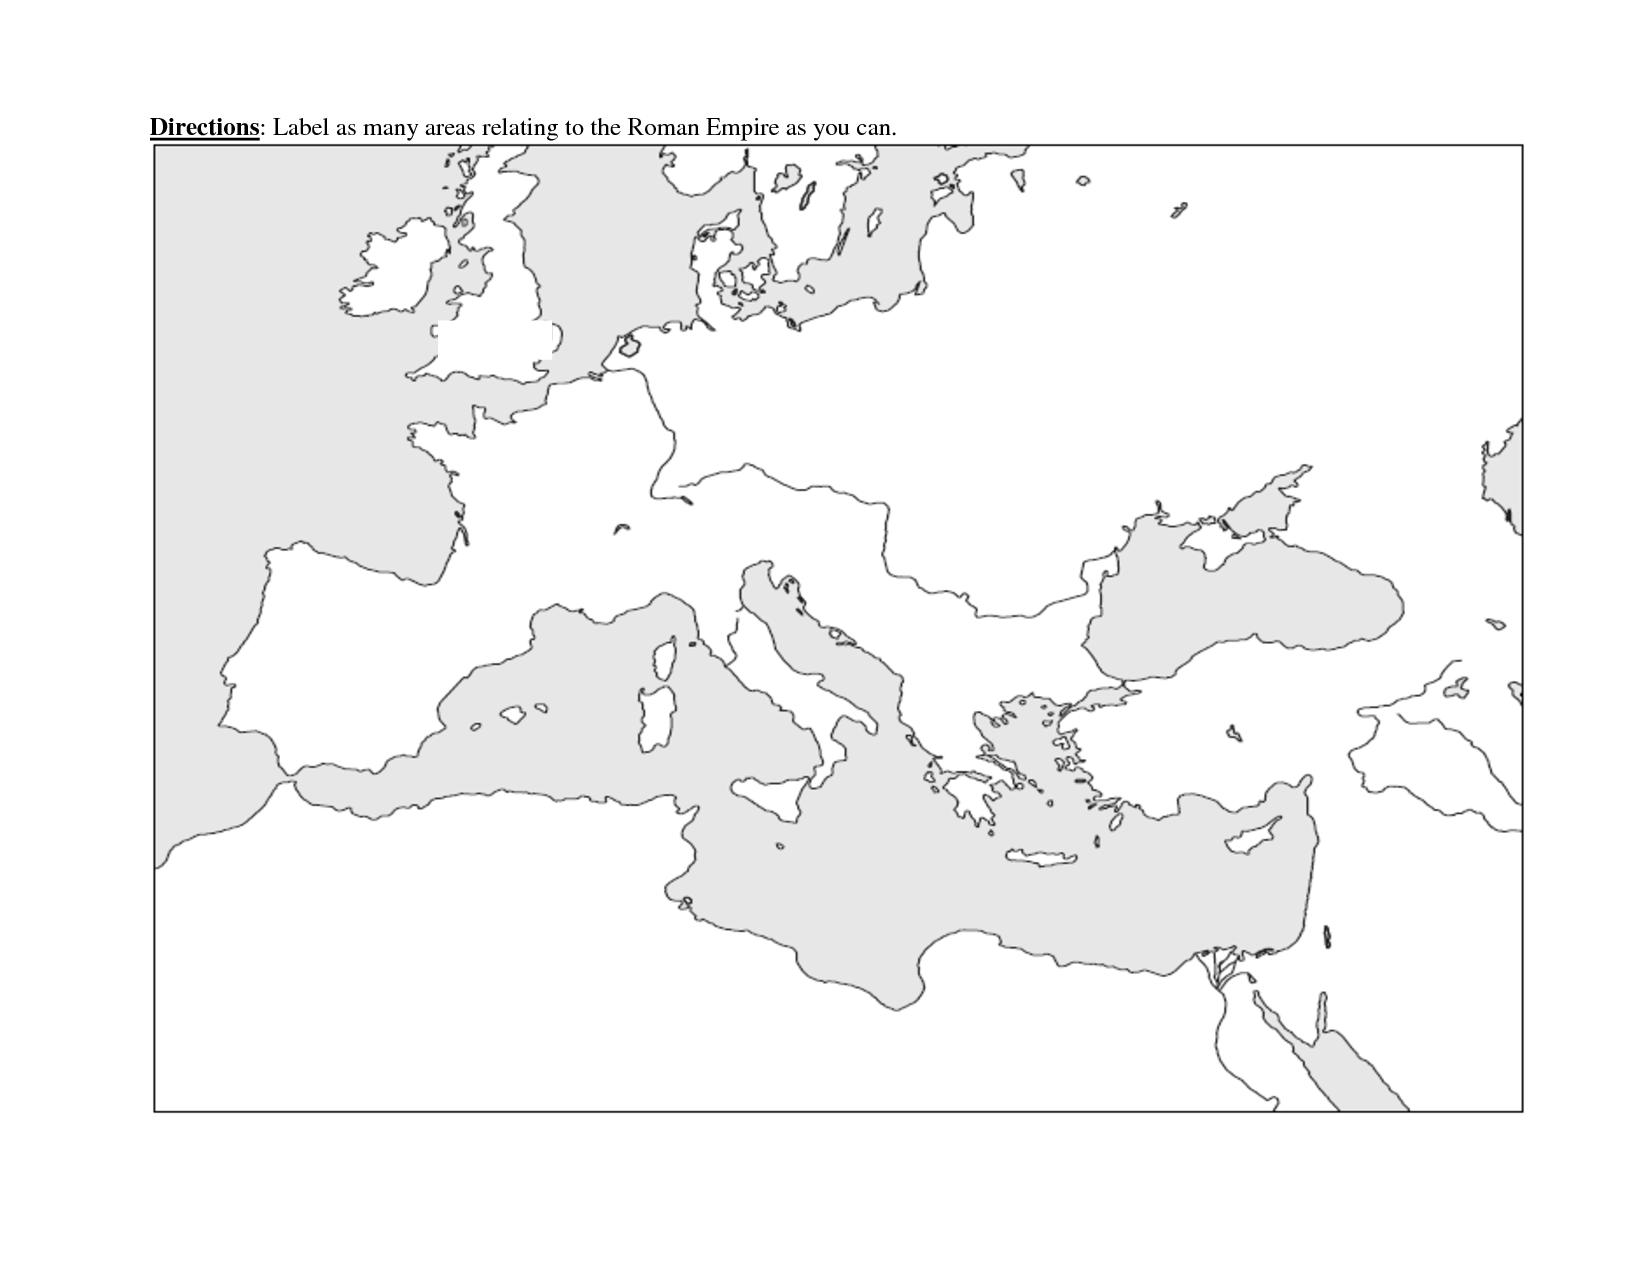 blank roman empire map - Google Search | Roman empire map, Roman ...